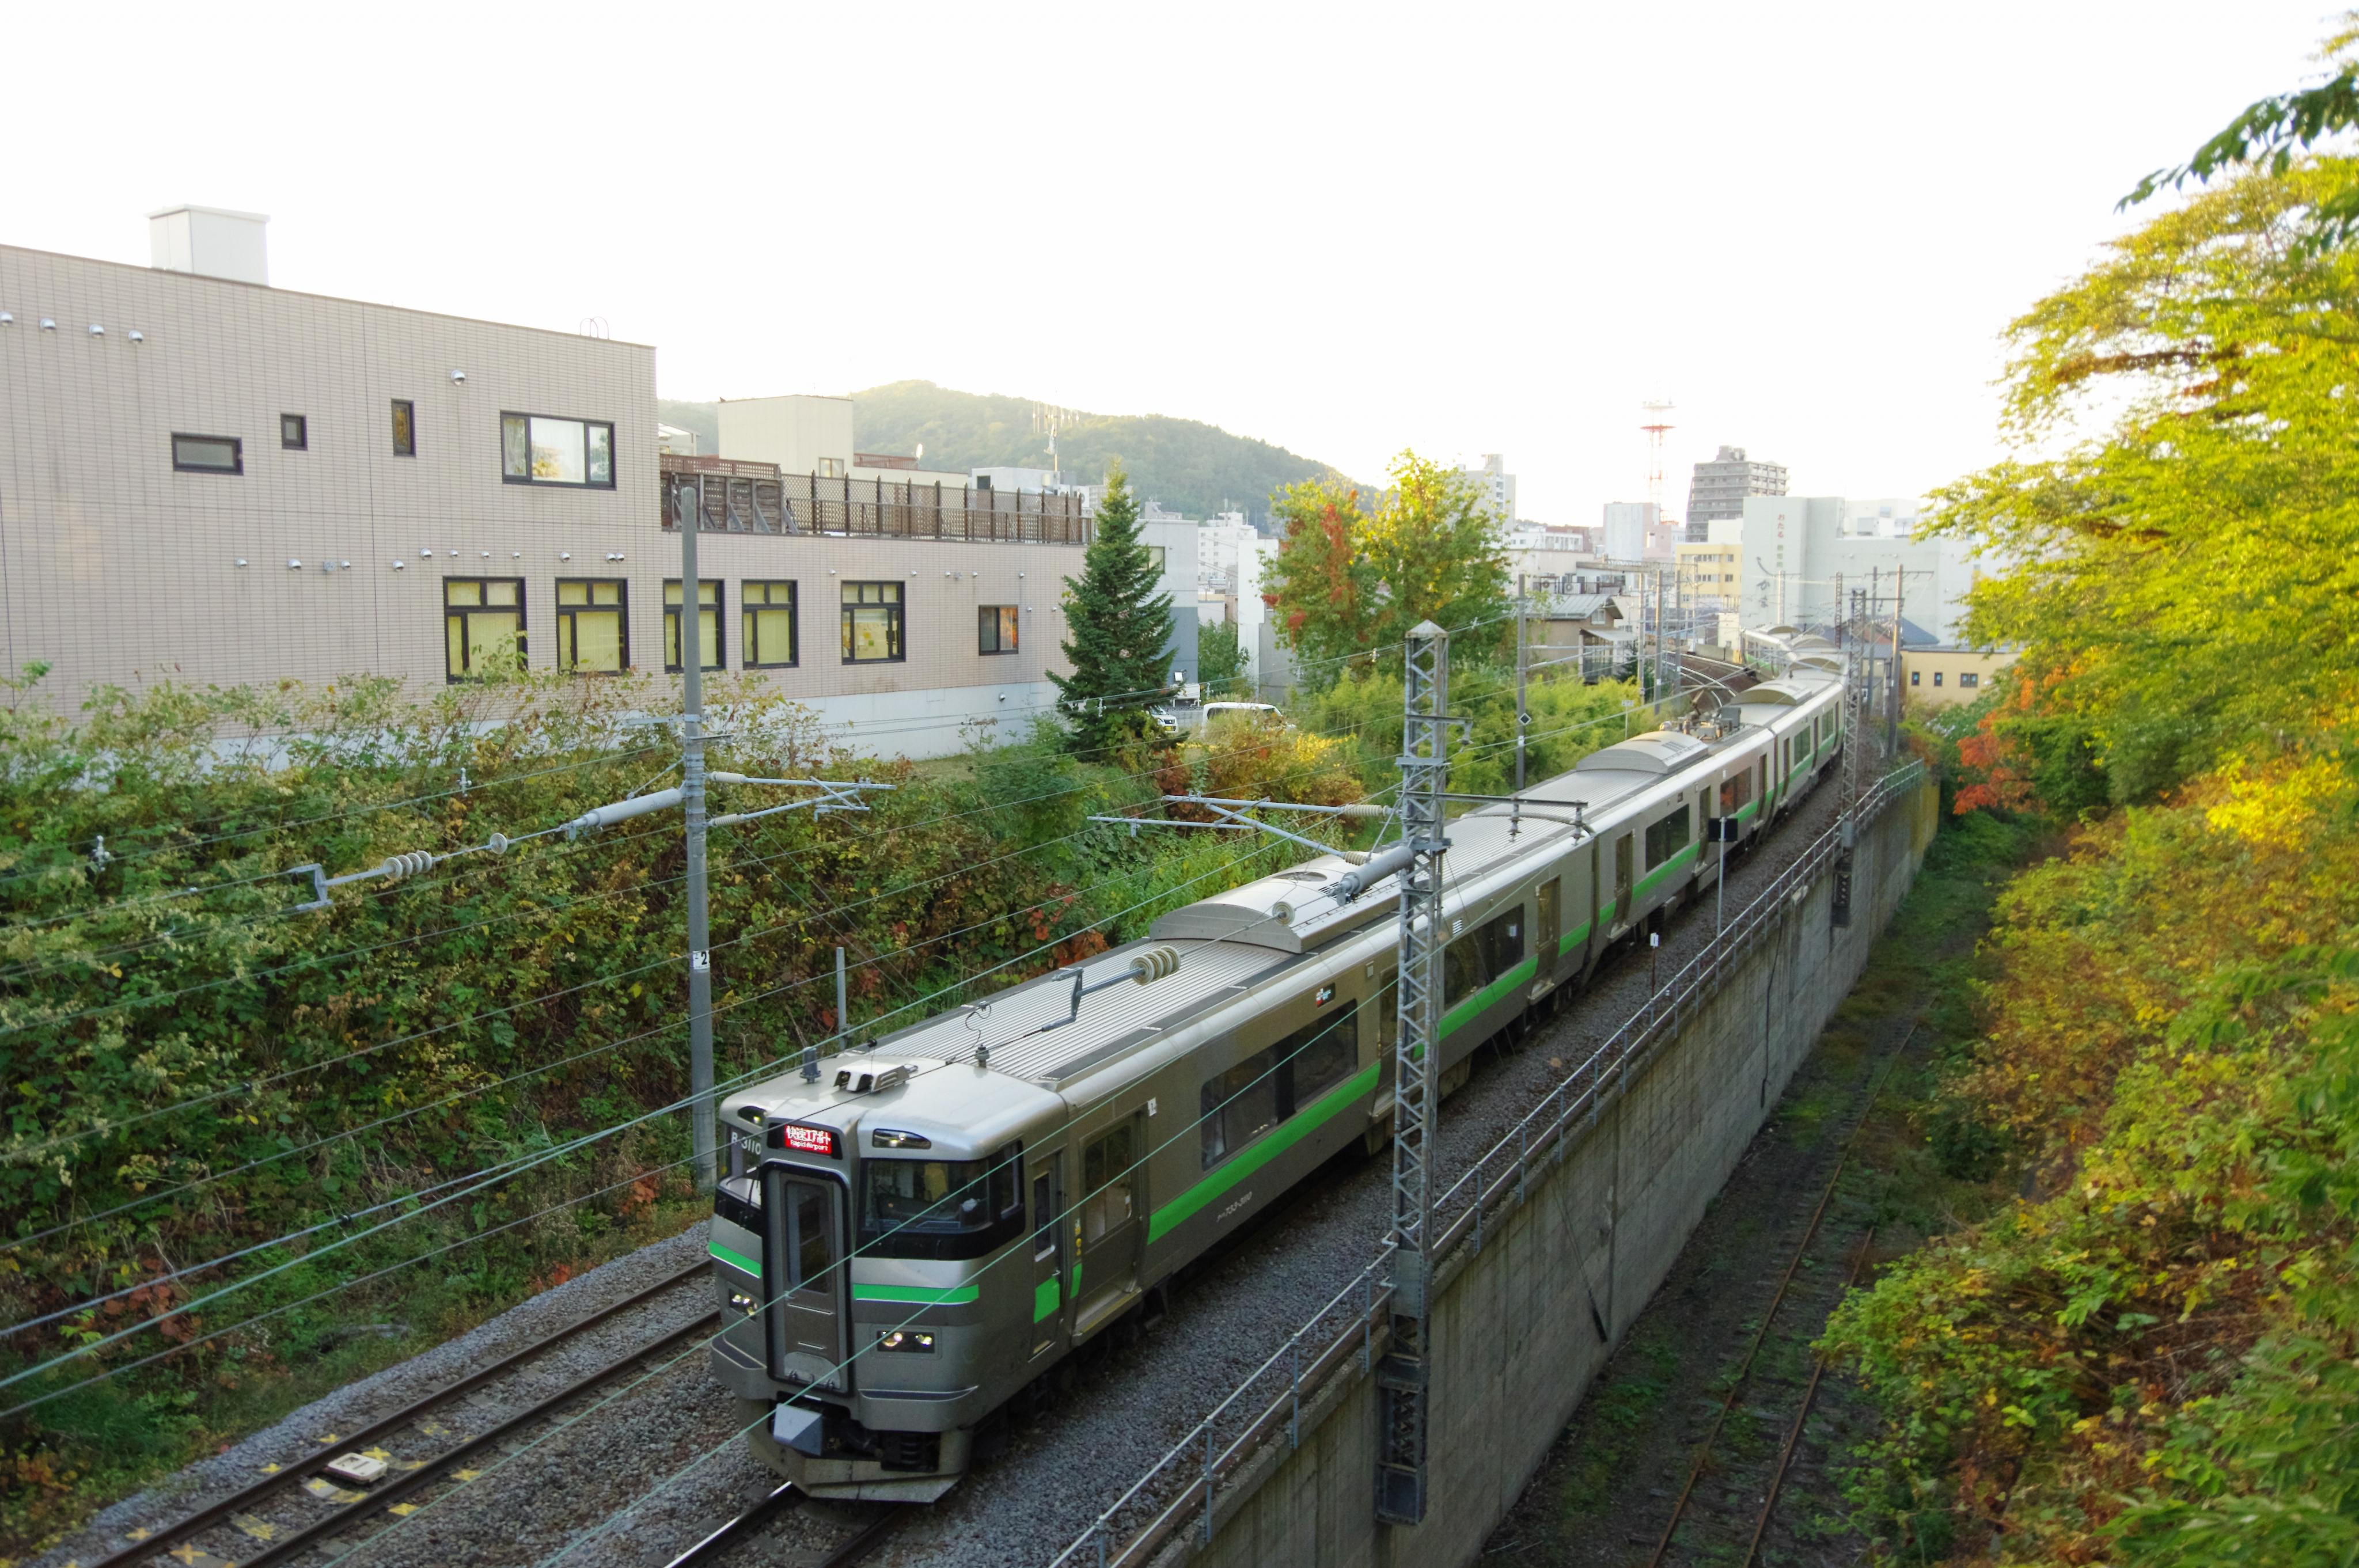 733系 3952M 快速エアポート164号 小樽−南小樽 花園橋 181022.jpg